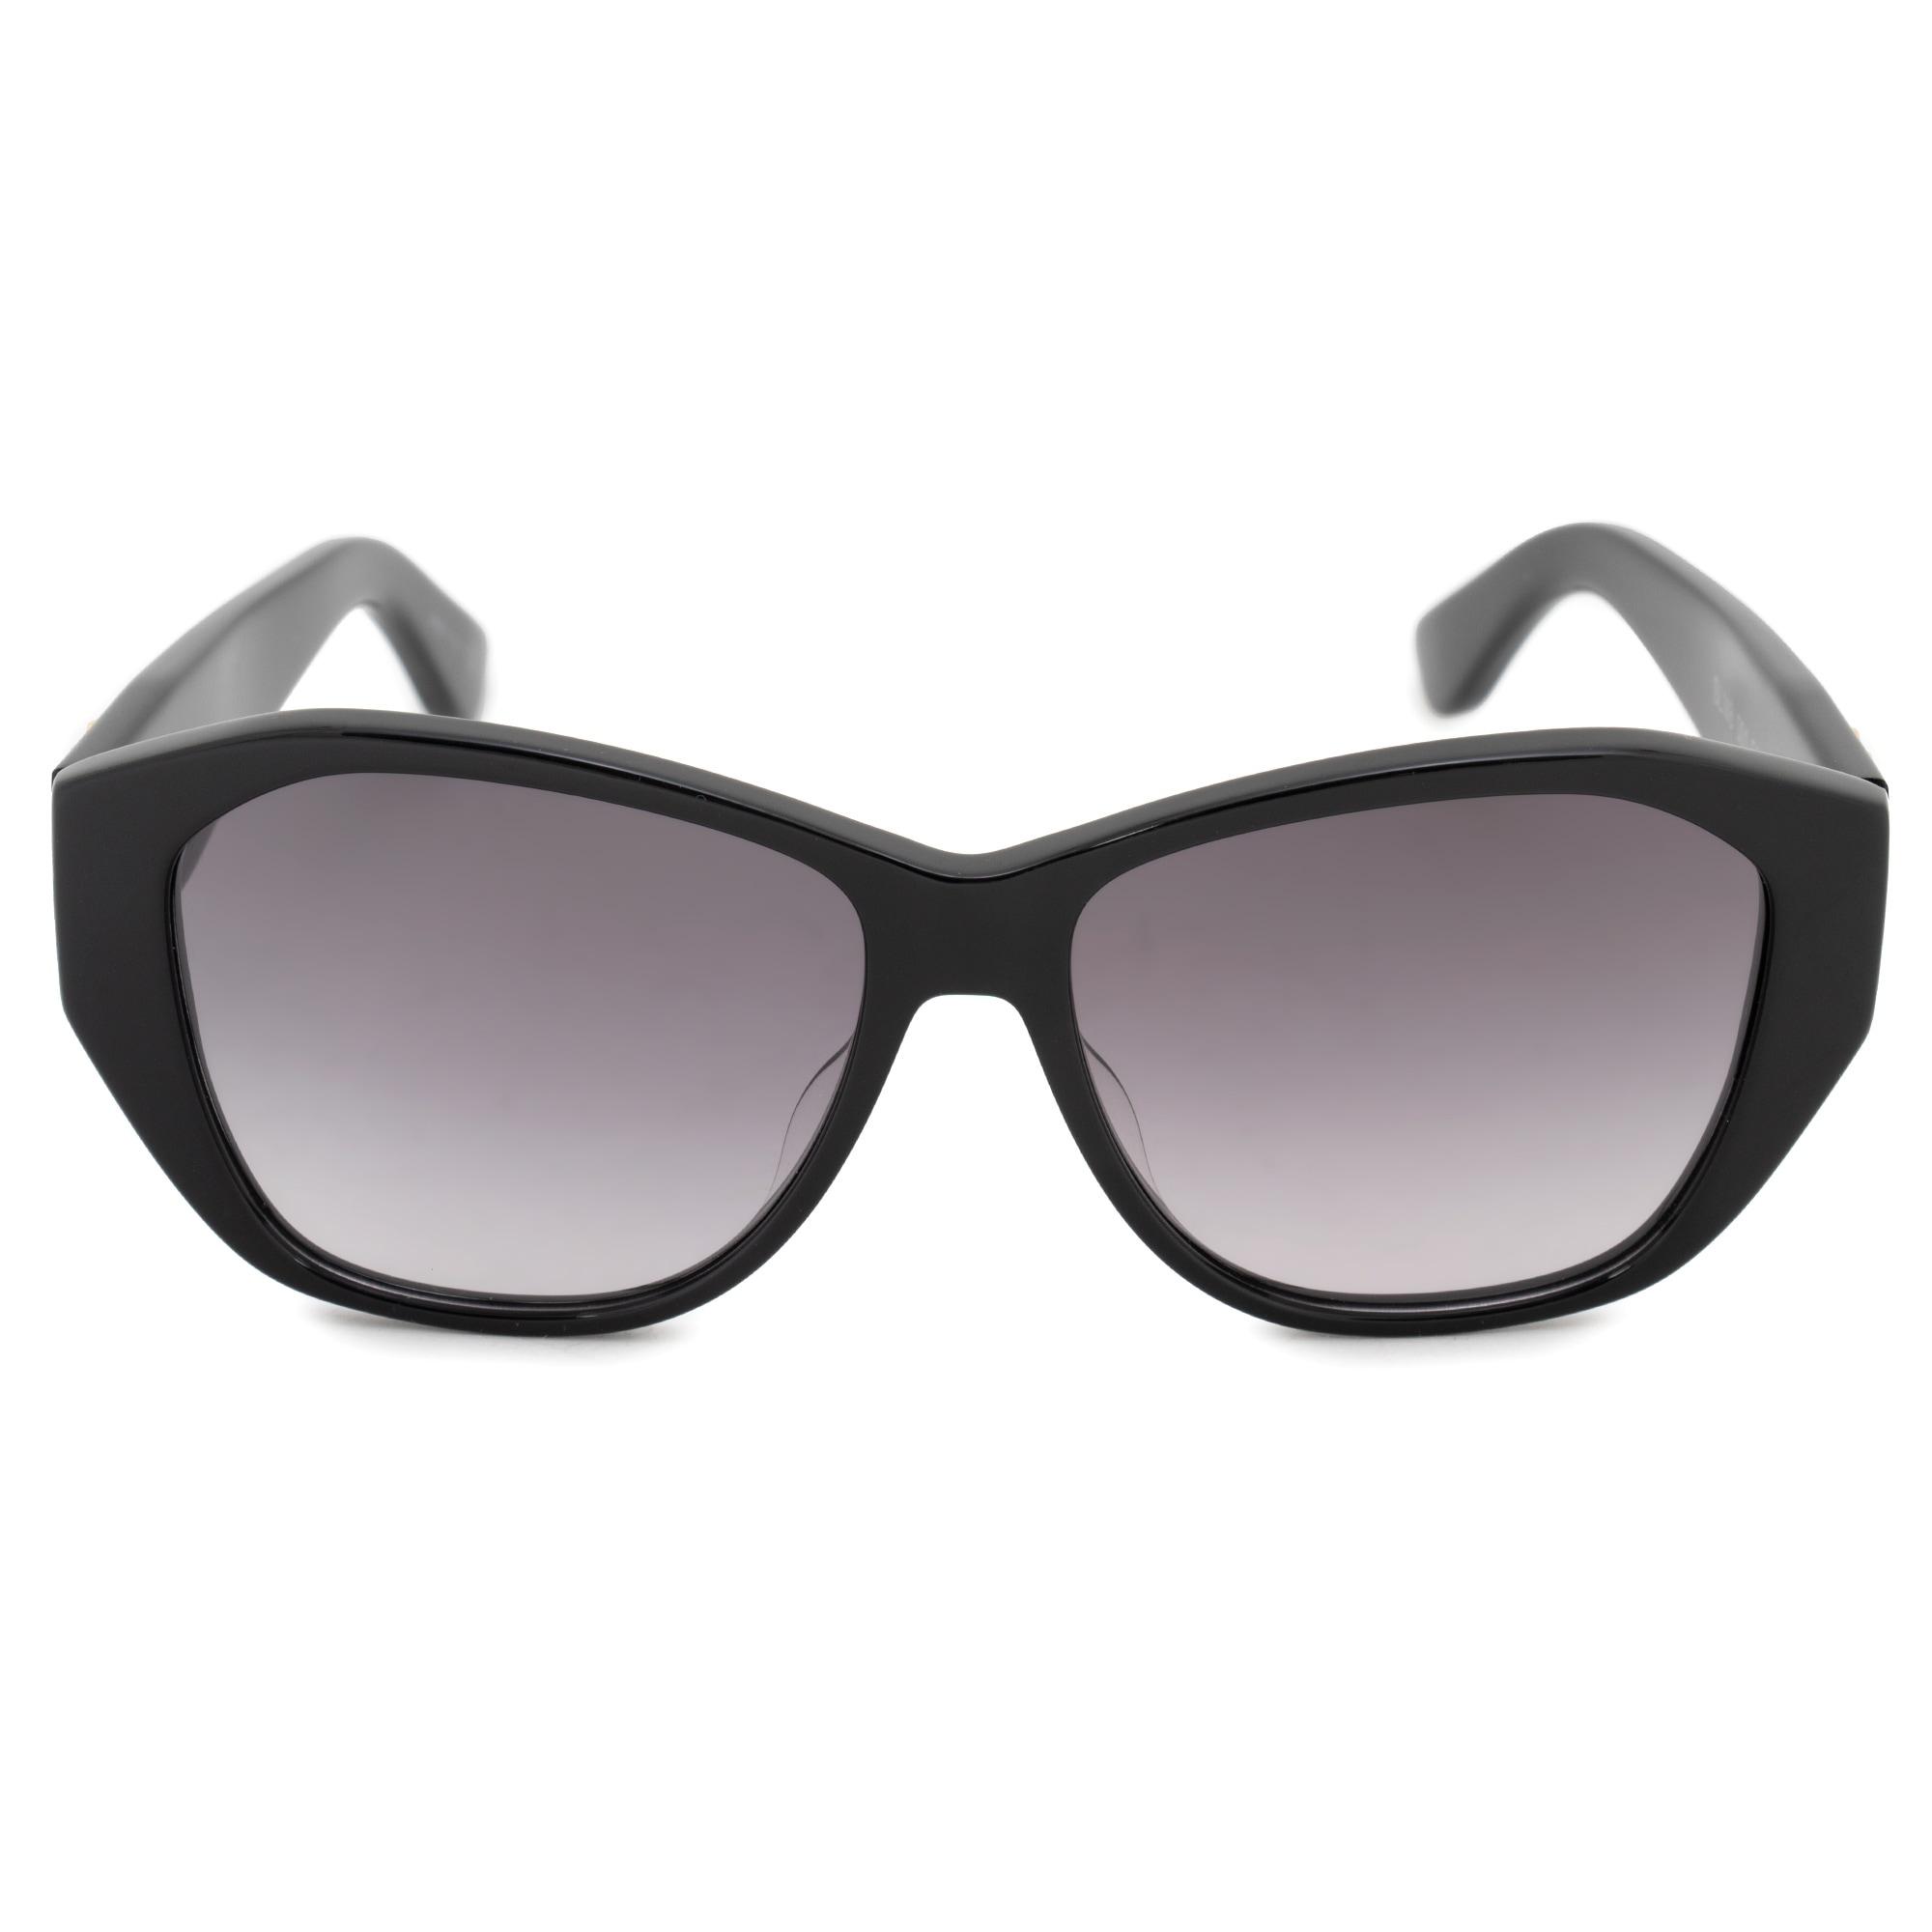 136ebb4a6801 Shop Saint Laurent Oversized Sunglasses SLM8 001 56 - Free Shipping ...